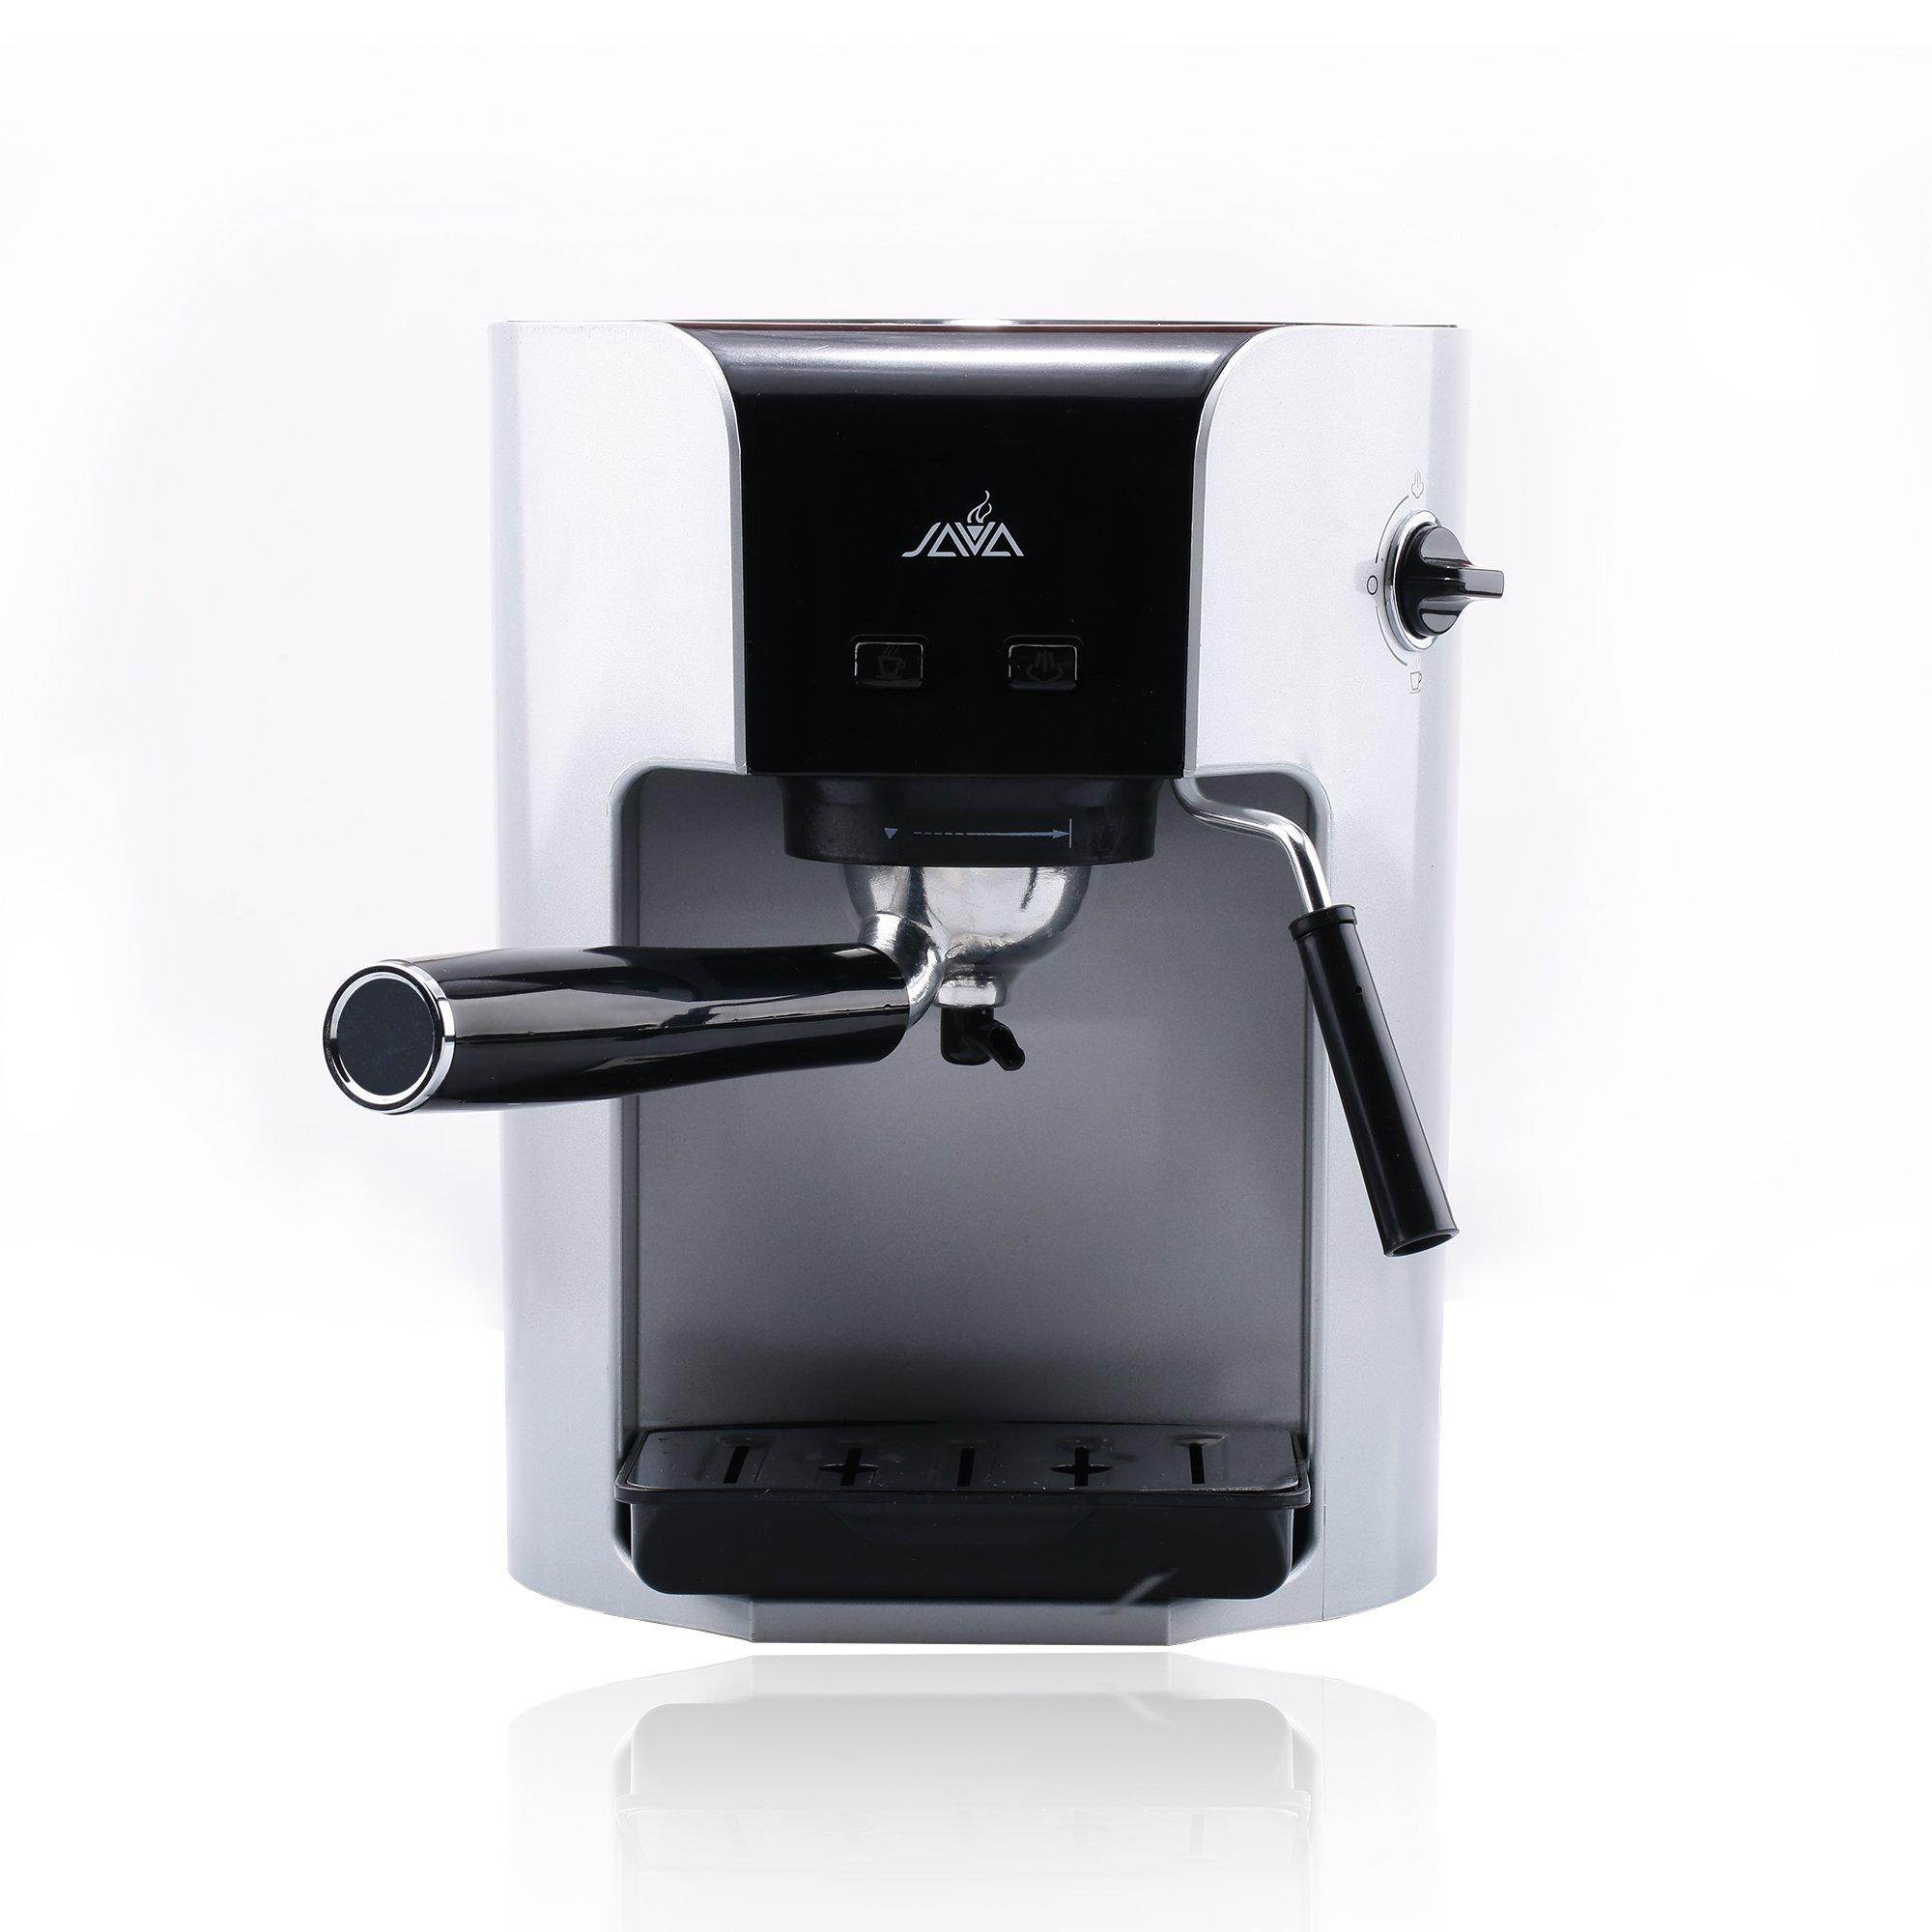 Java WSD18-050 Semi Auto ESPRESSO Coffee Maker With Milk Frother Coffee Pod Coffee Power Hard Capsule Drip Coffee Machine,Silver by JAVA